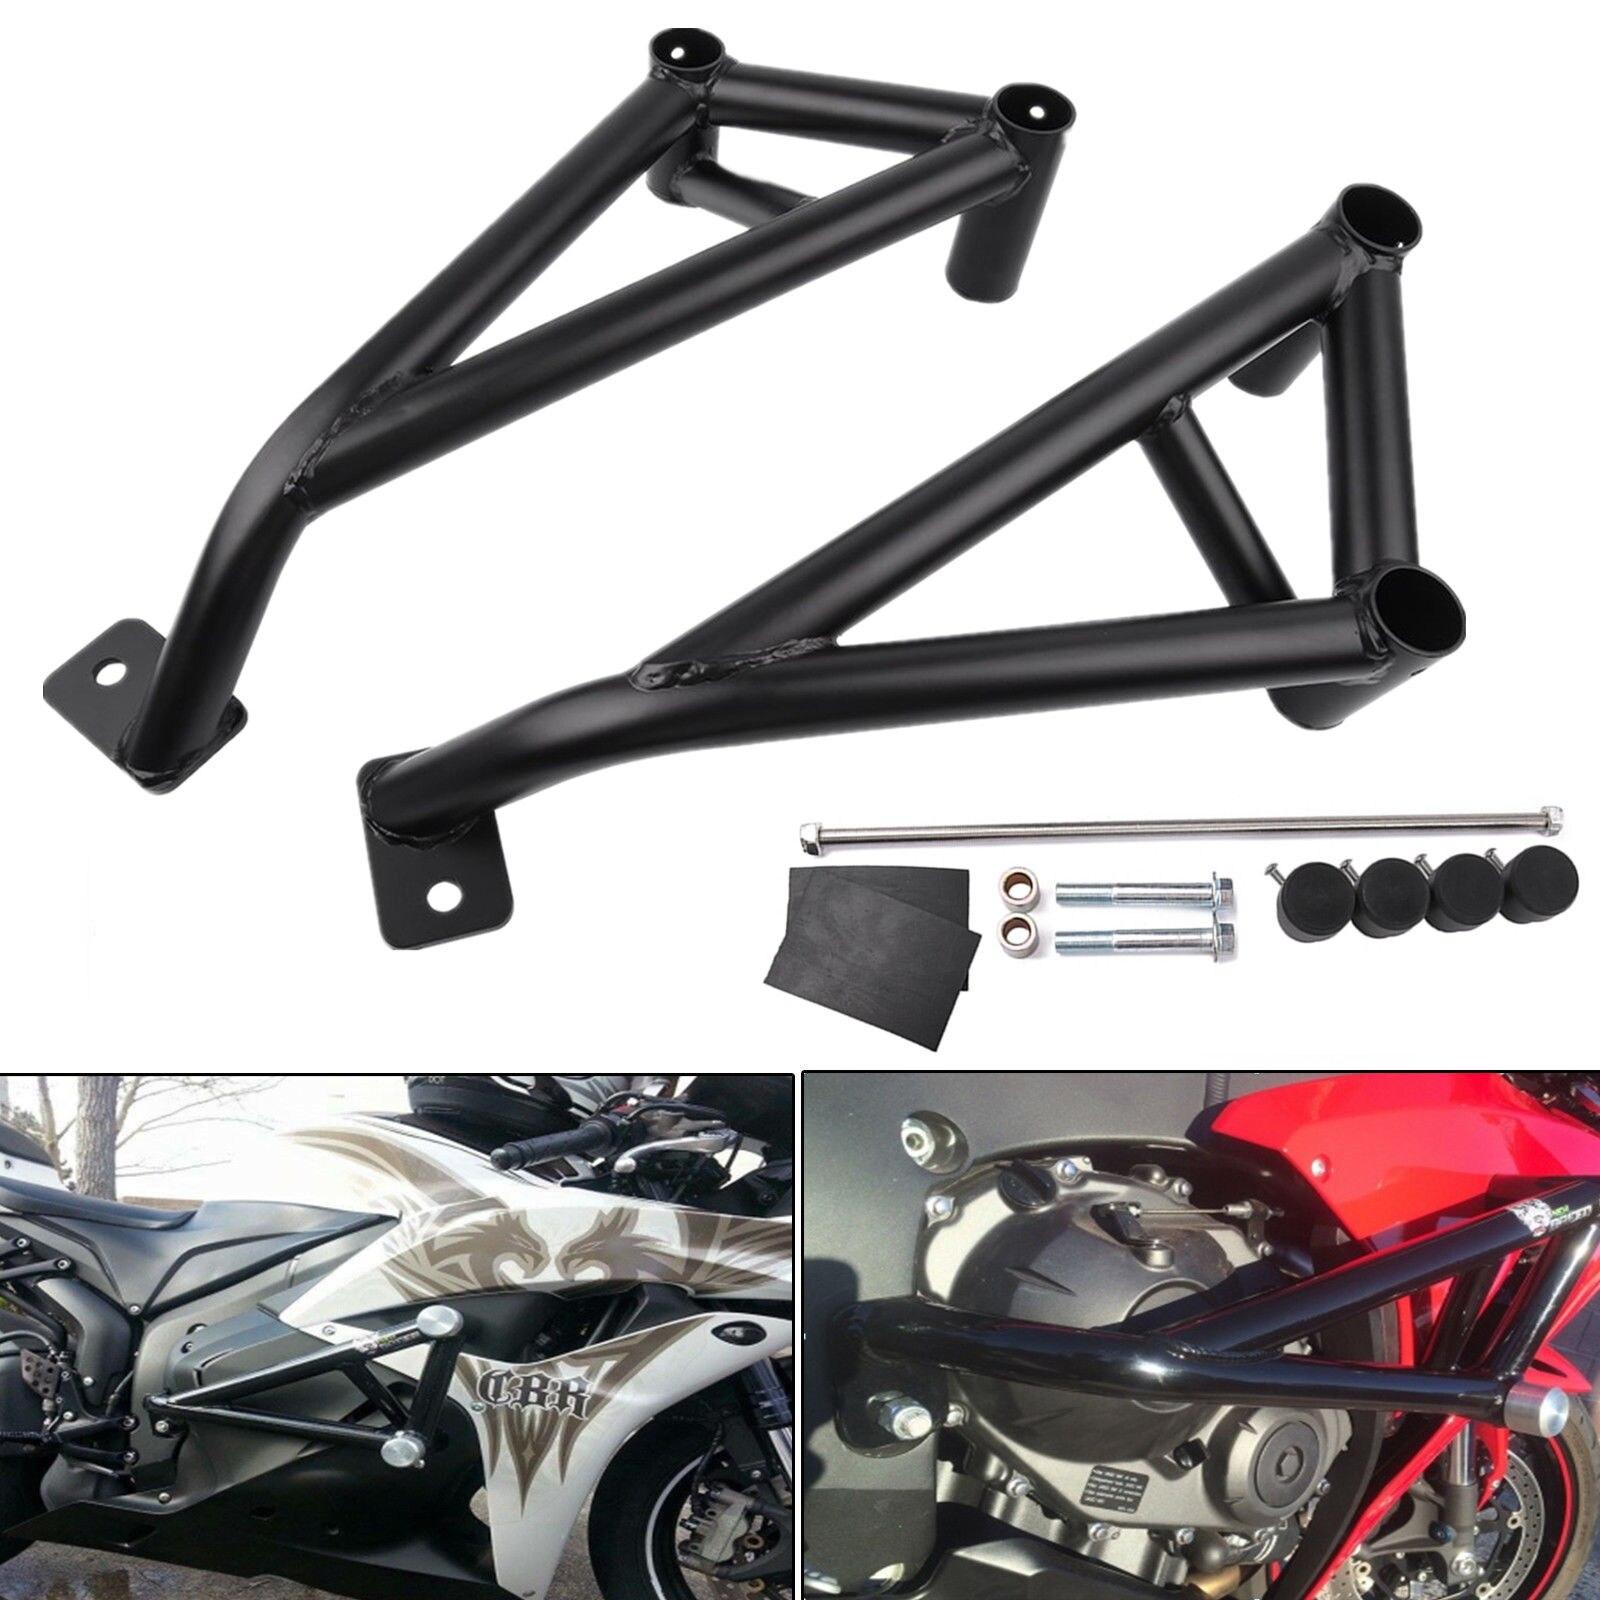 CBR 1000RR Motorcycle Black Engine Highway Crash Bar Guard Protector for Honda CBR1000RR 2008 2009 2010 2011 2012 2013 2014 2015